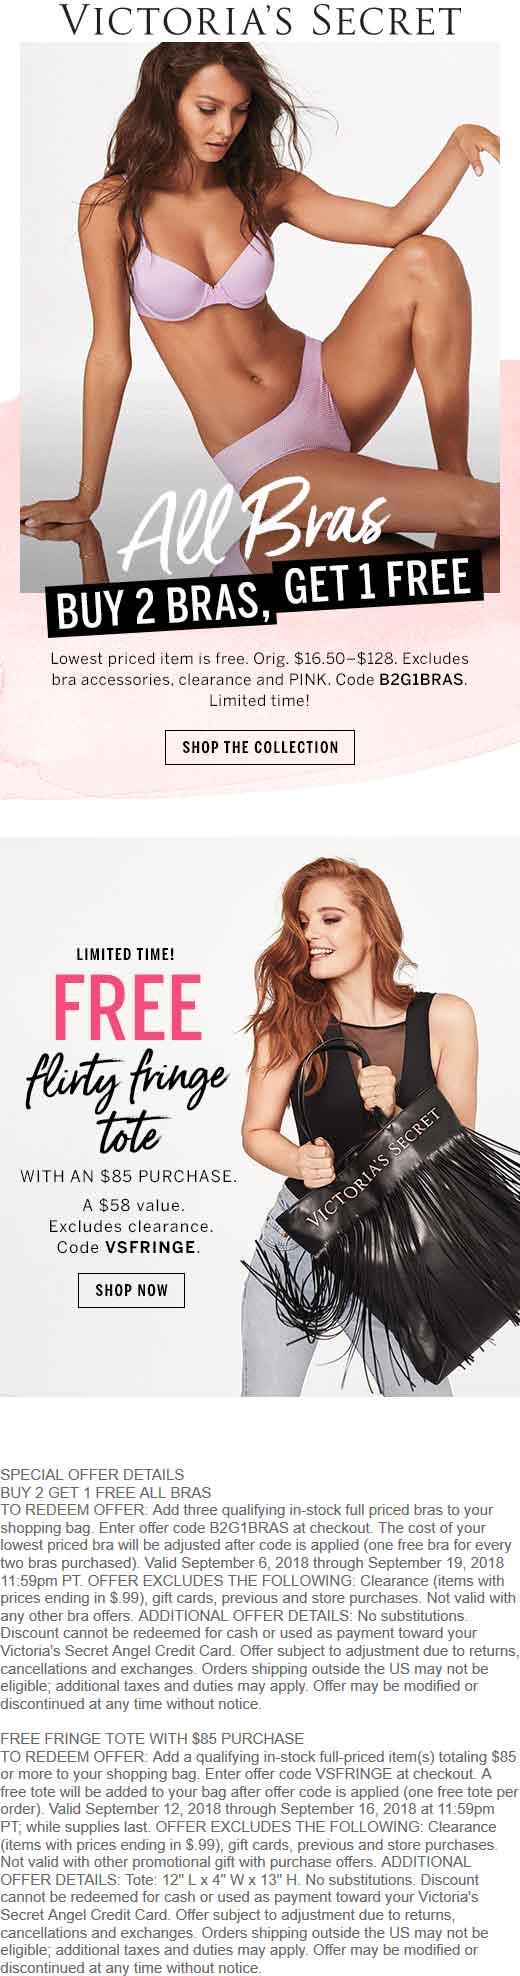 Victorias Secret Coupon May 2020 Free fringe tote with $85 spent today at Victorias Secret, or online via promo code VSFRINGE